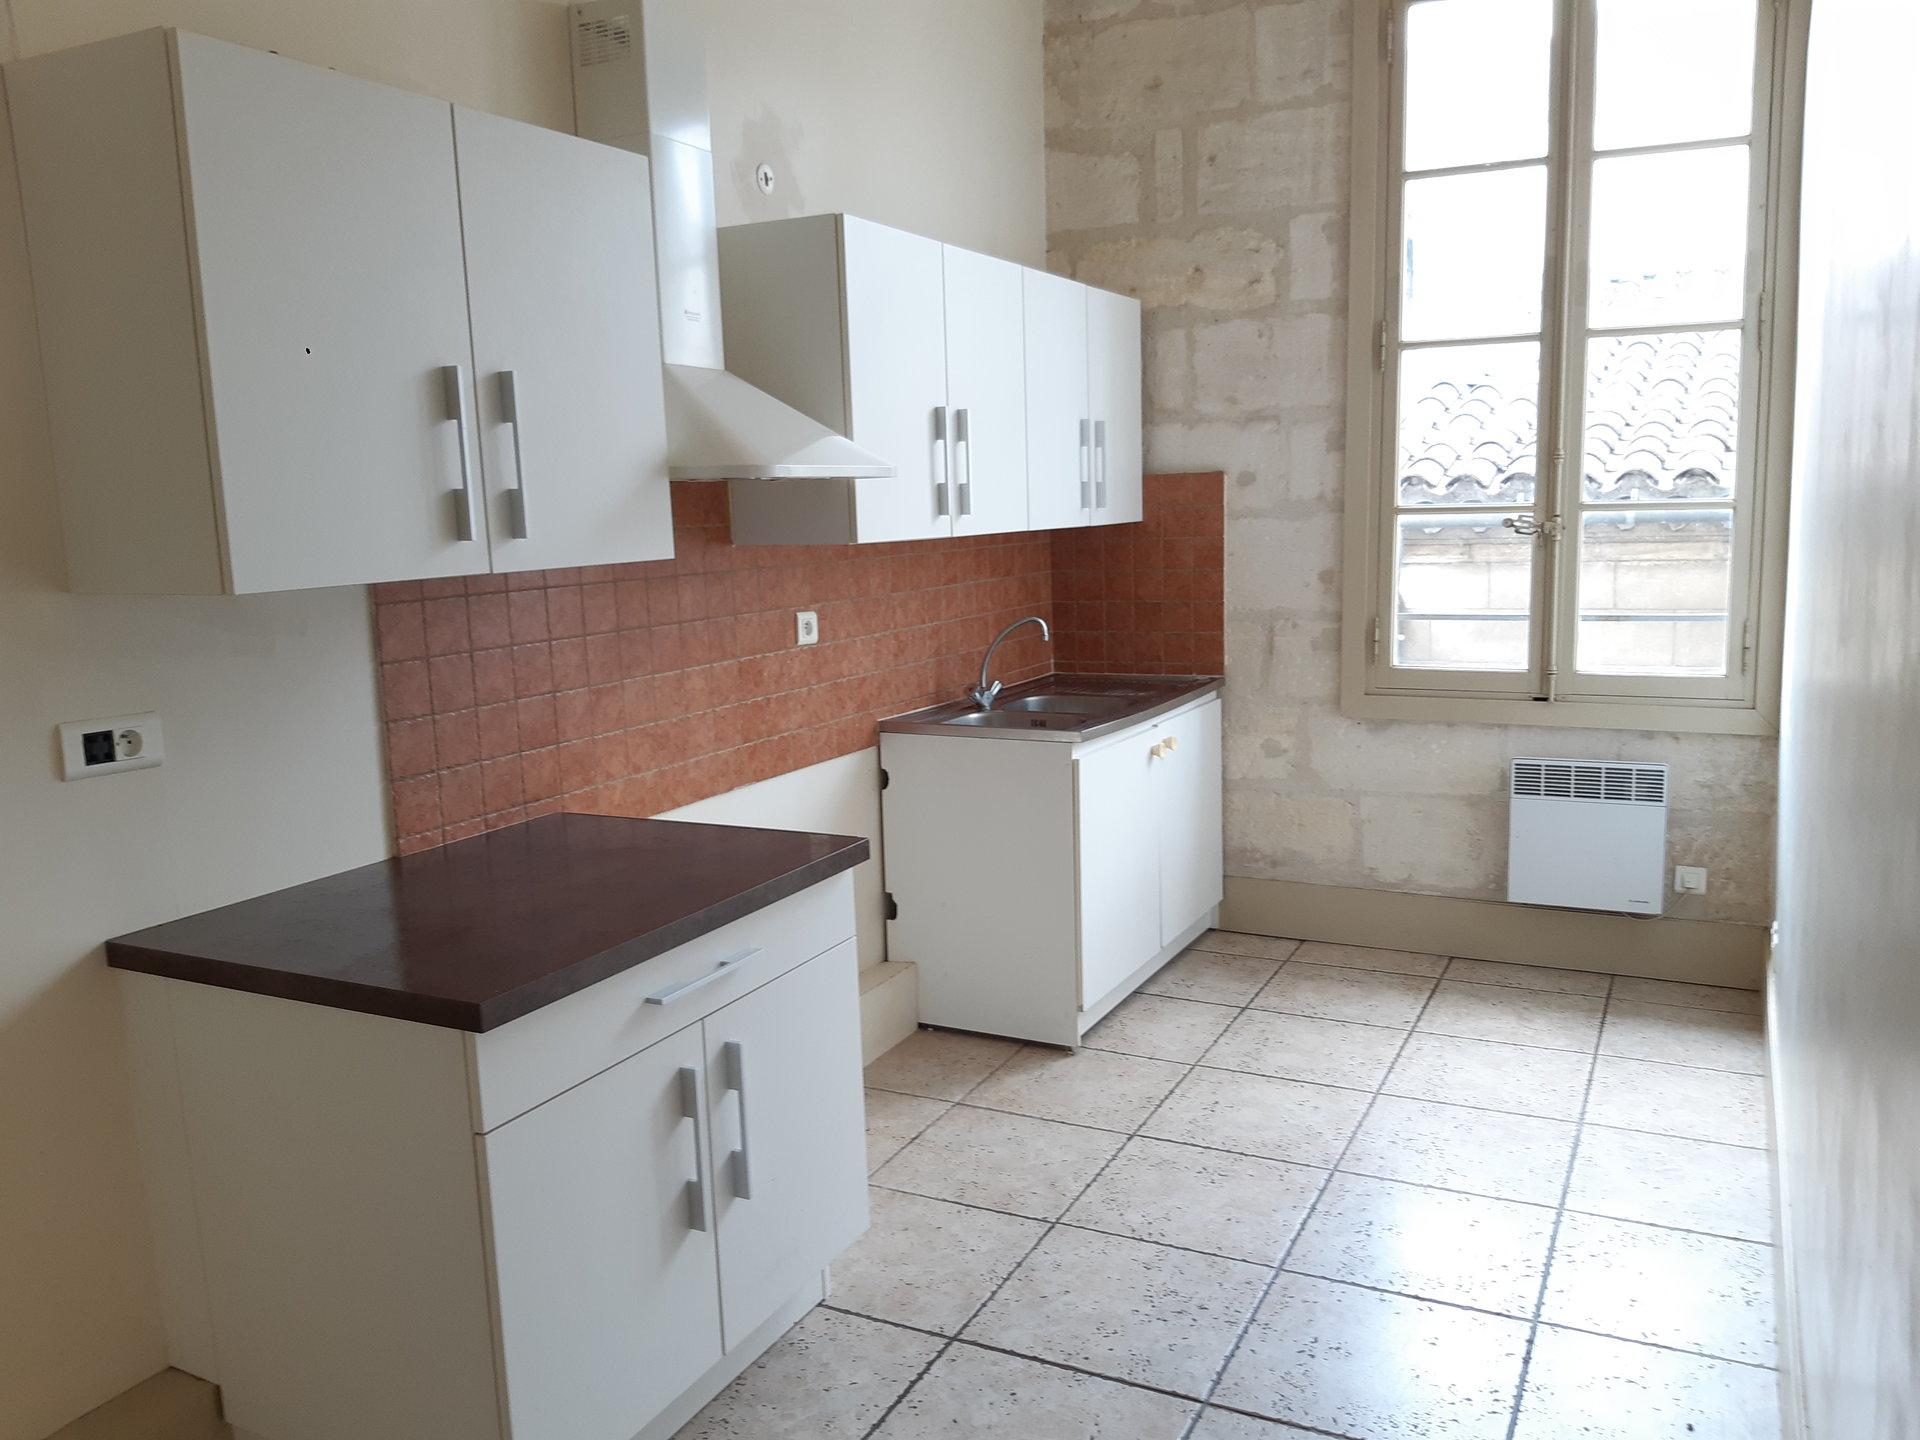 Location Appartement BEAUCAIRE Mandat : 0265